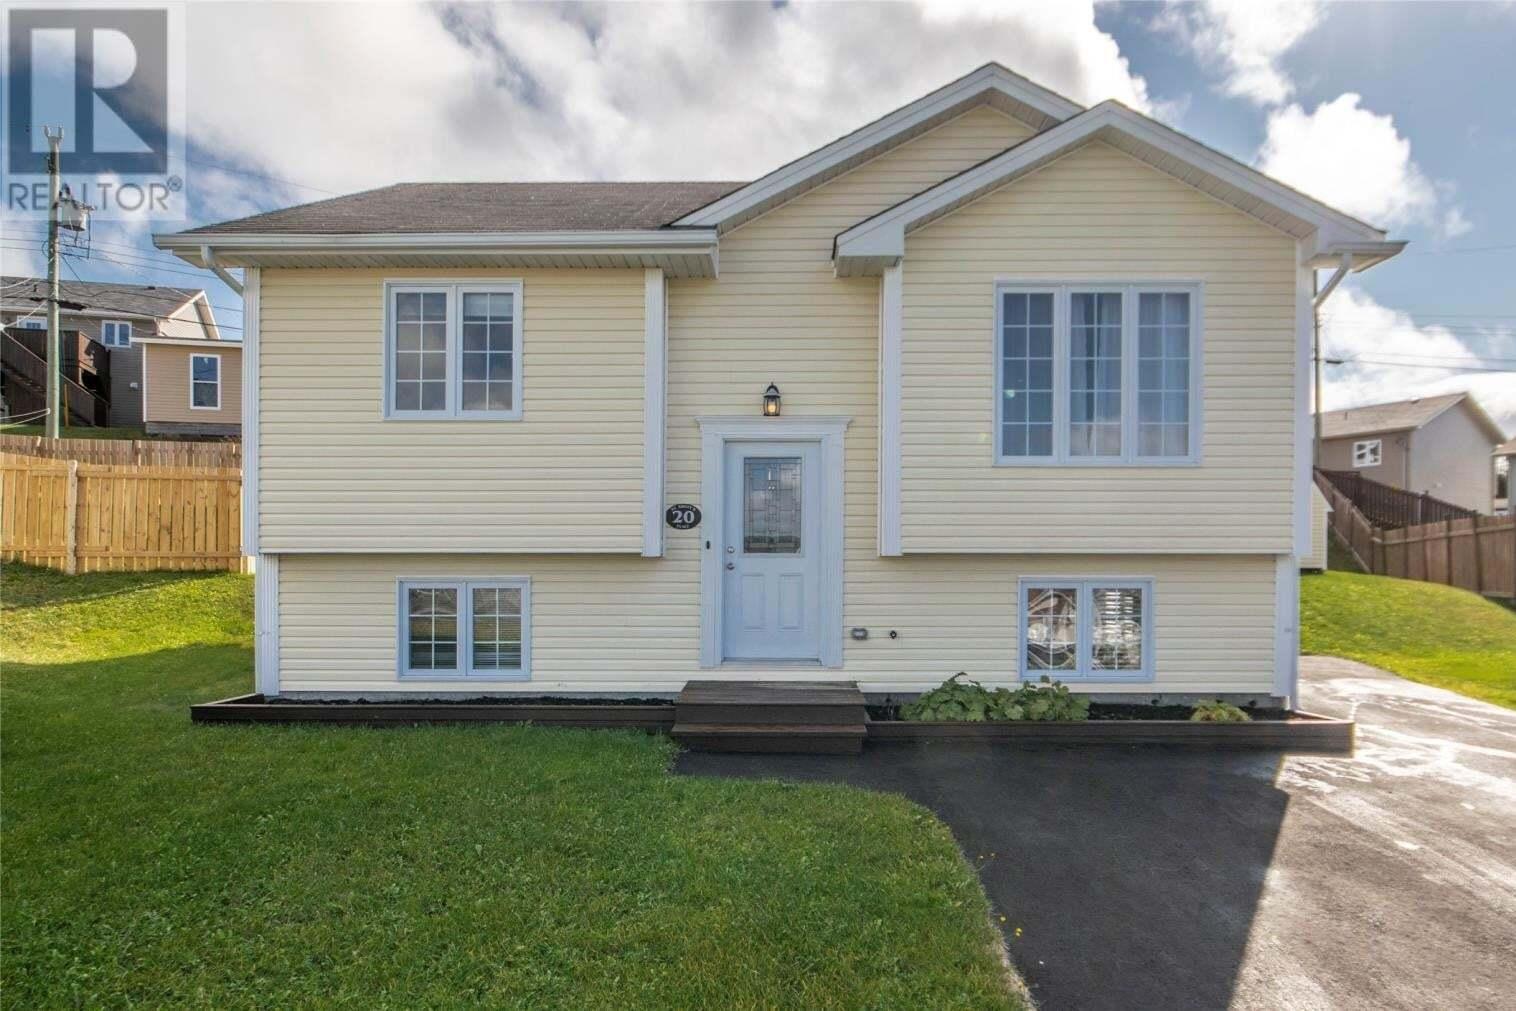 House for sale at 20 St. Shott's Pl St. John's Newfoundland - MLS: 1222576